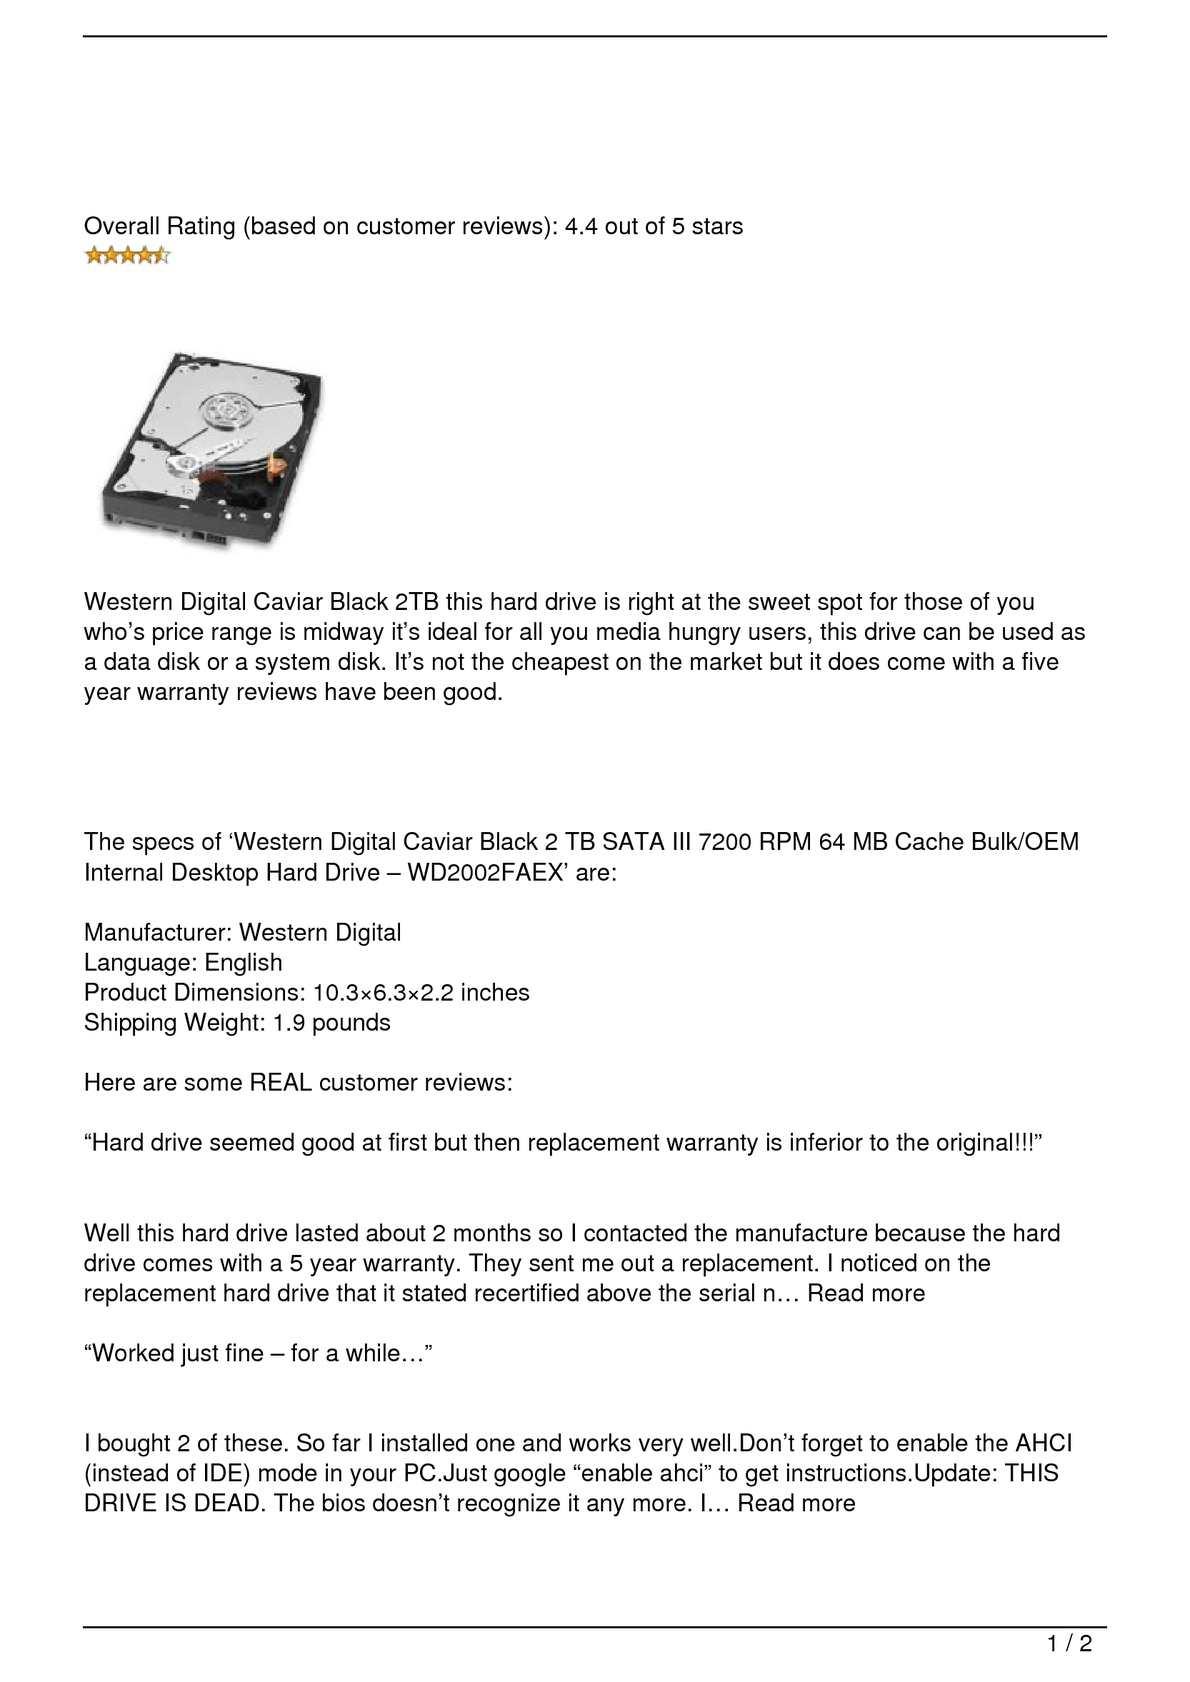 Calaméo - Western Digital Caviar Black 2TB